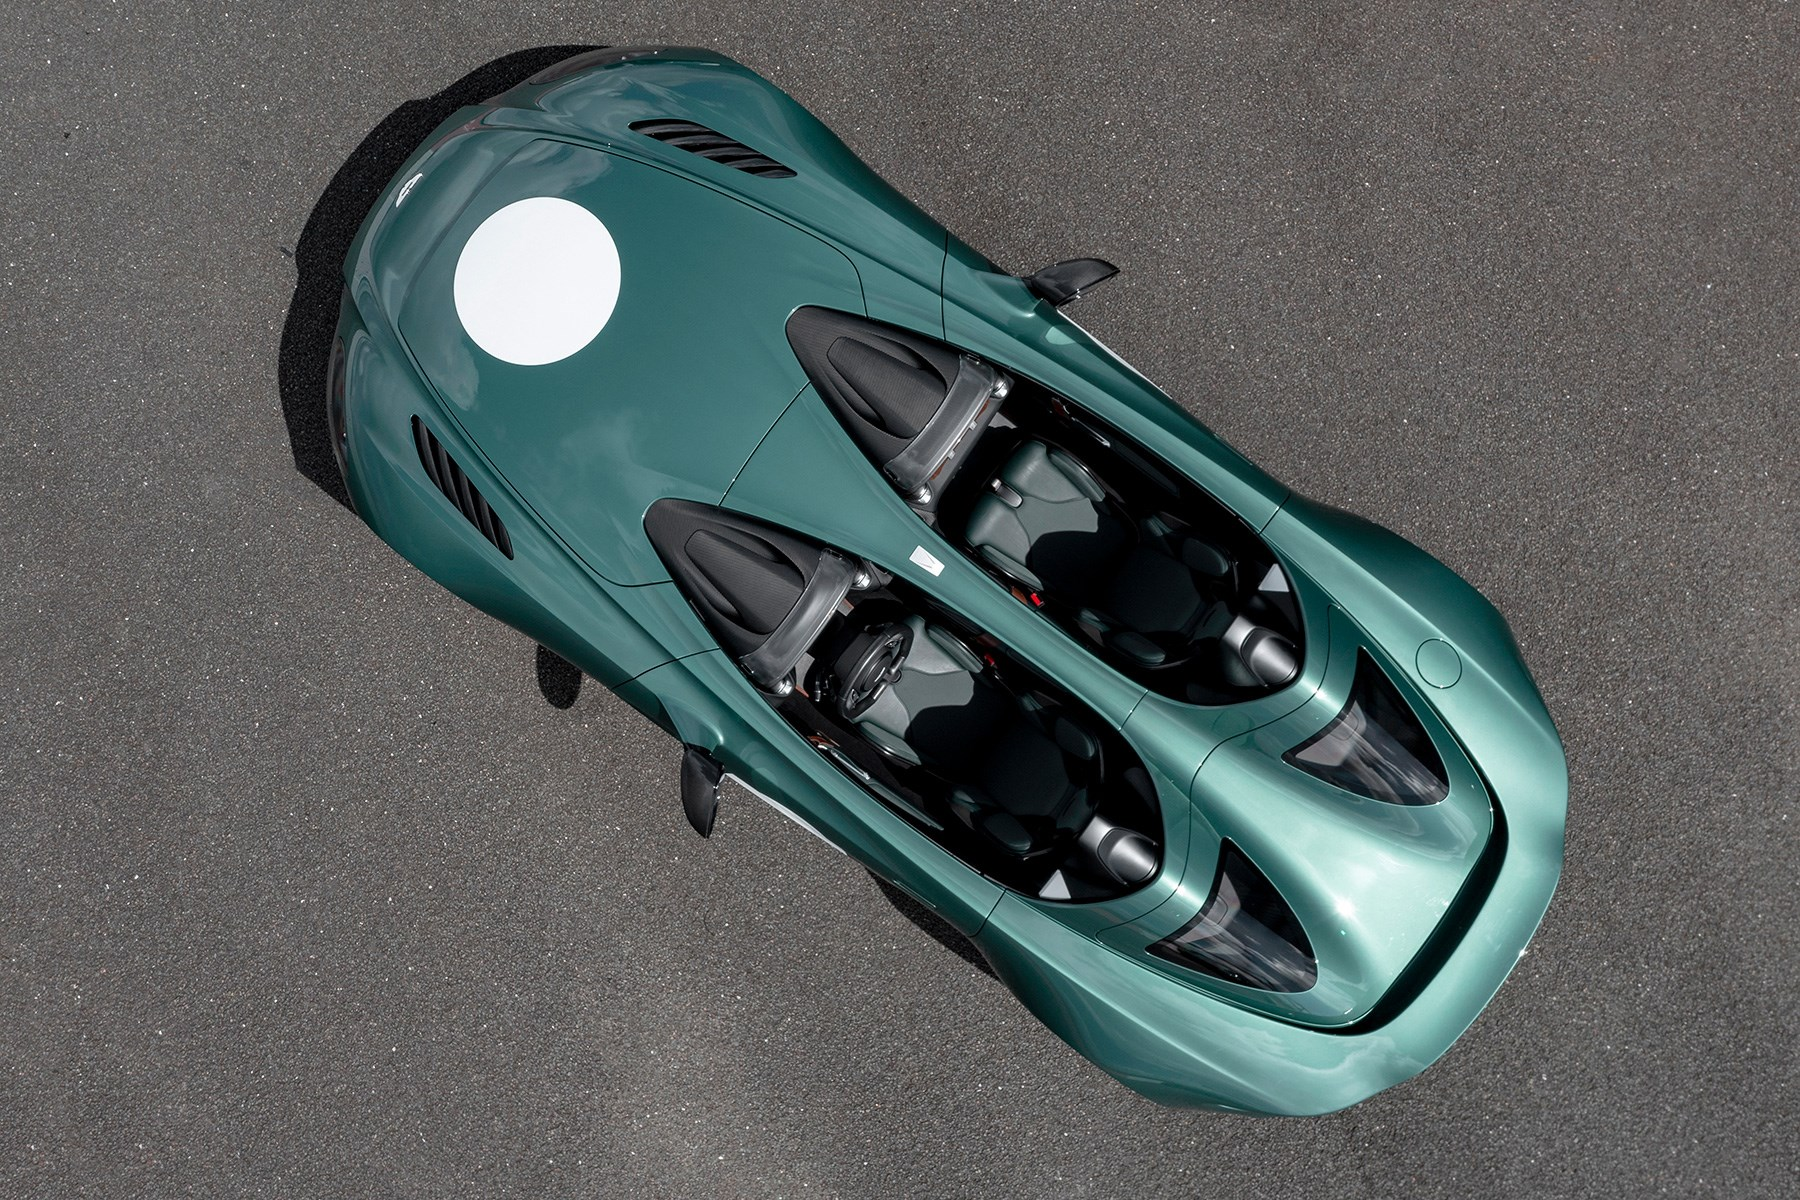 Aston Martin V12 Speedster bird's eye aerial view